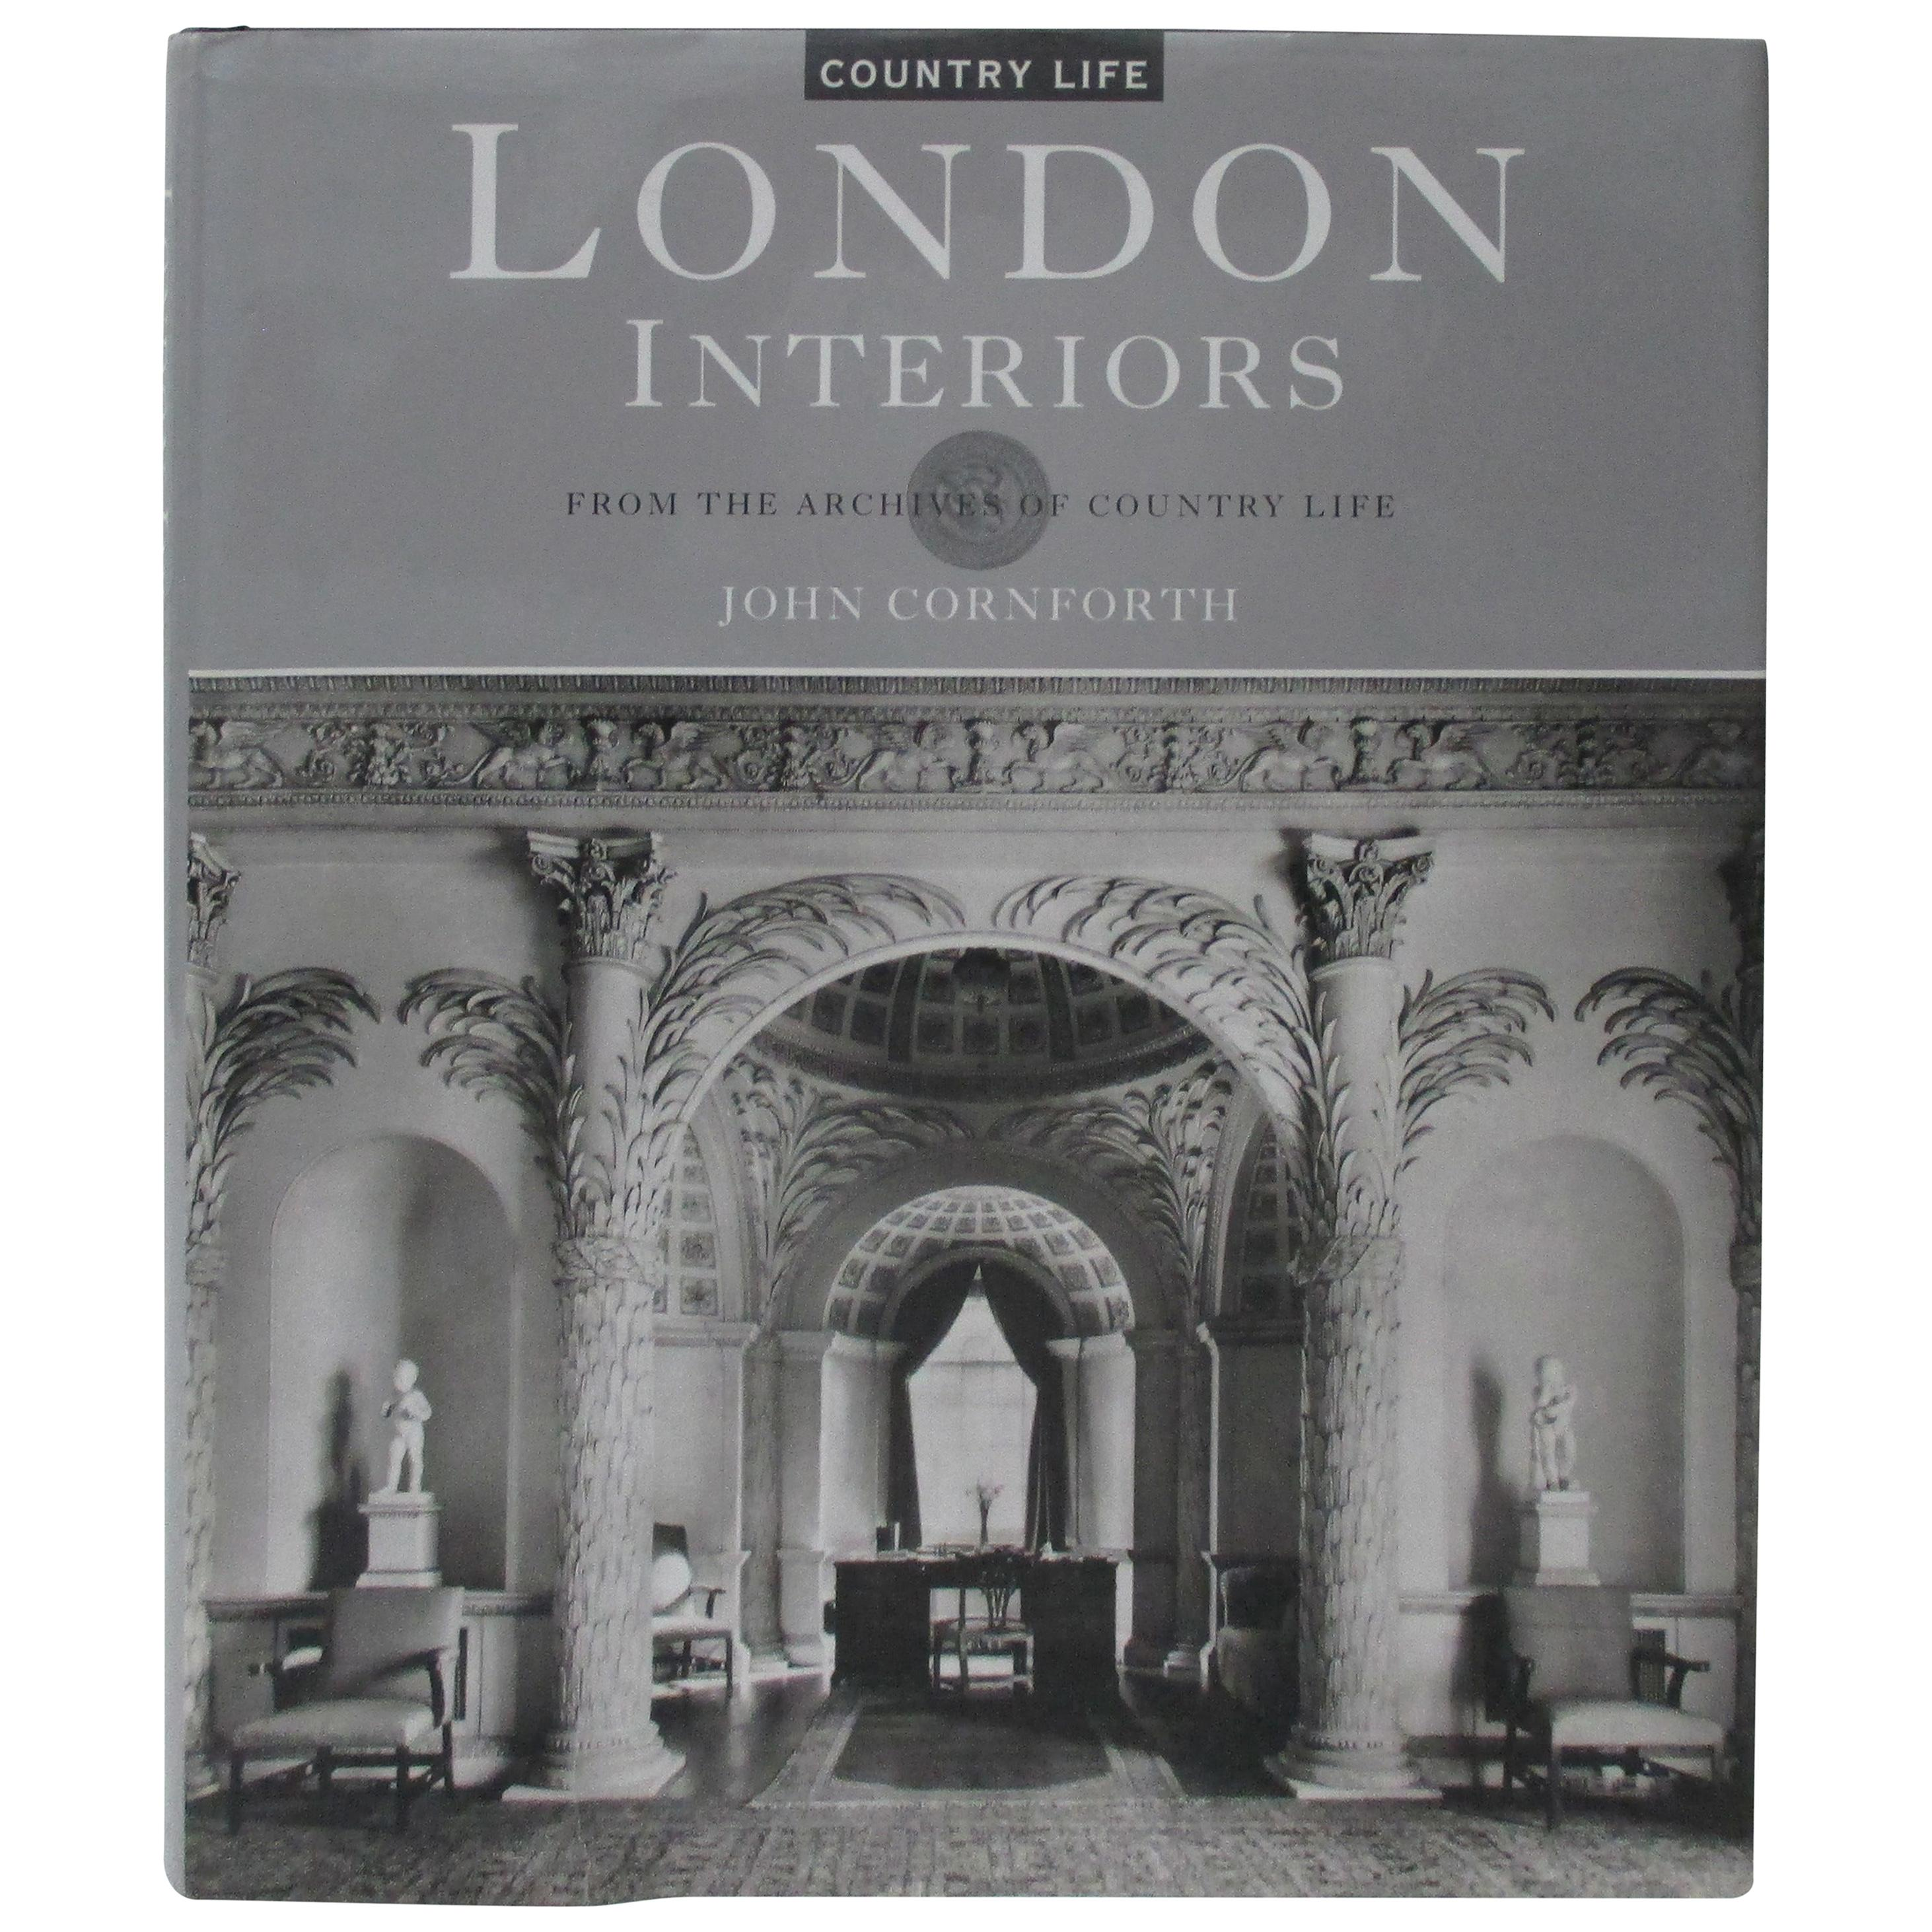 London Interiors Hardcover Decoration Book